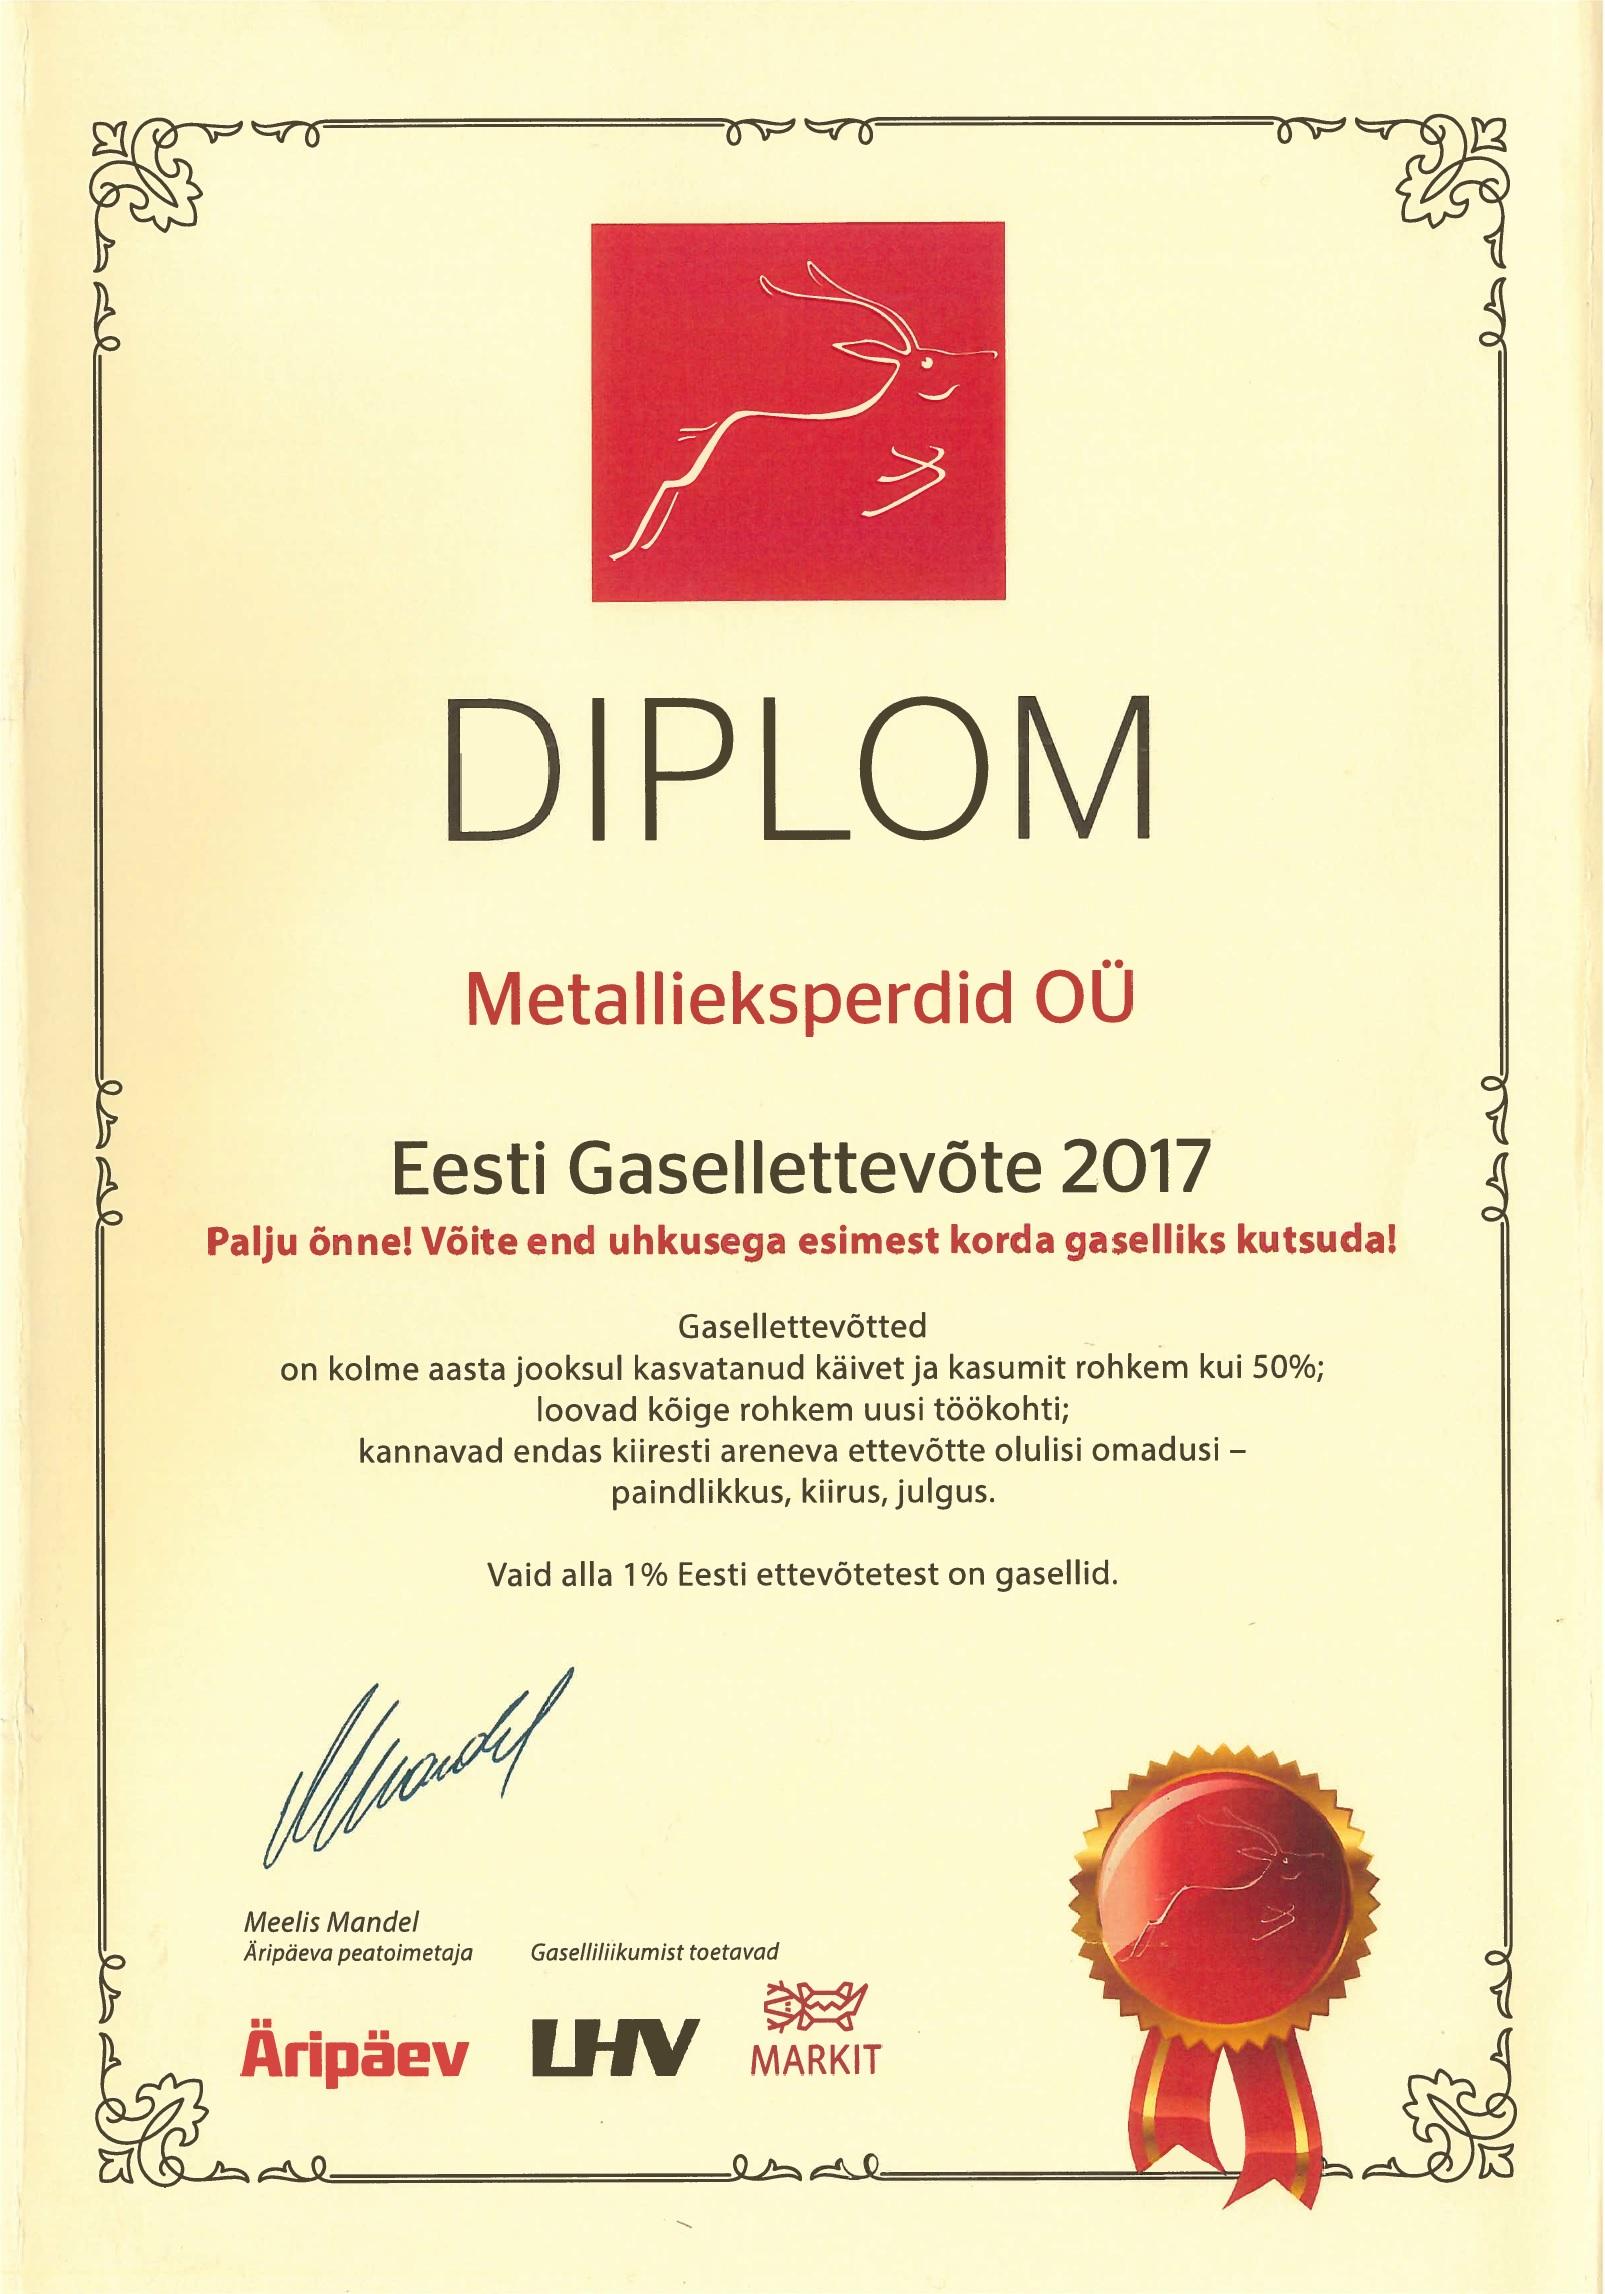 Metallieksperdid OÜ on Gasell 2017